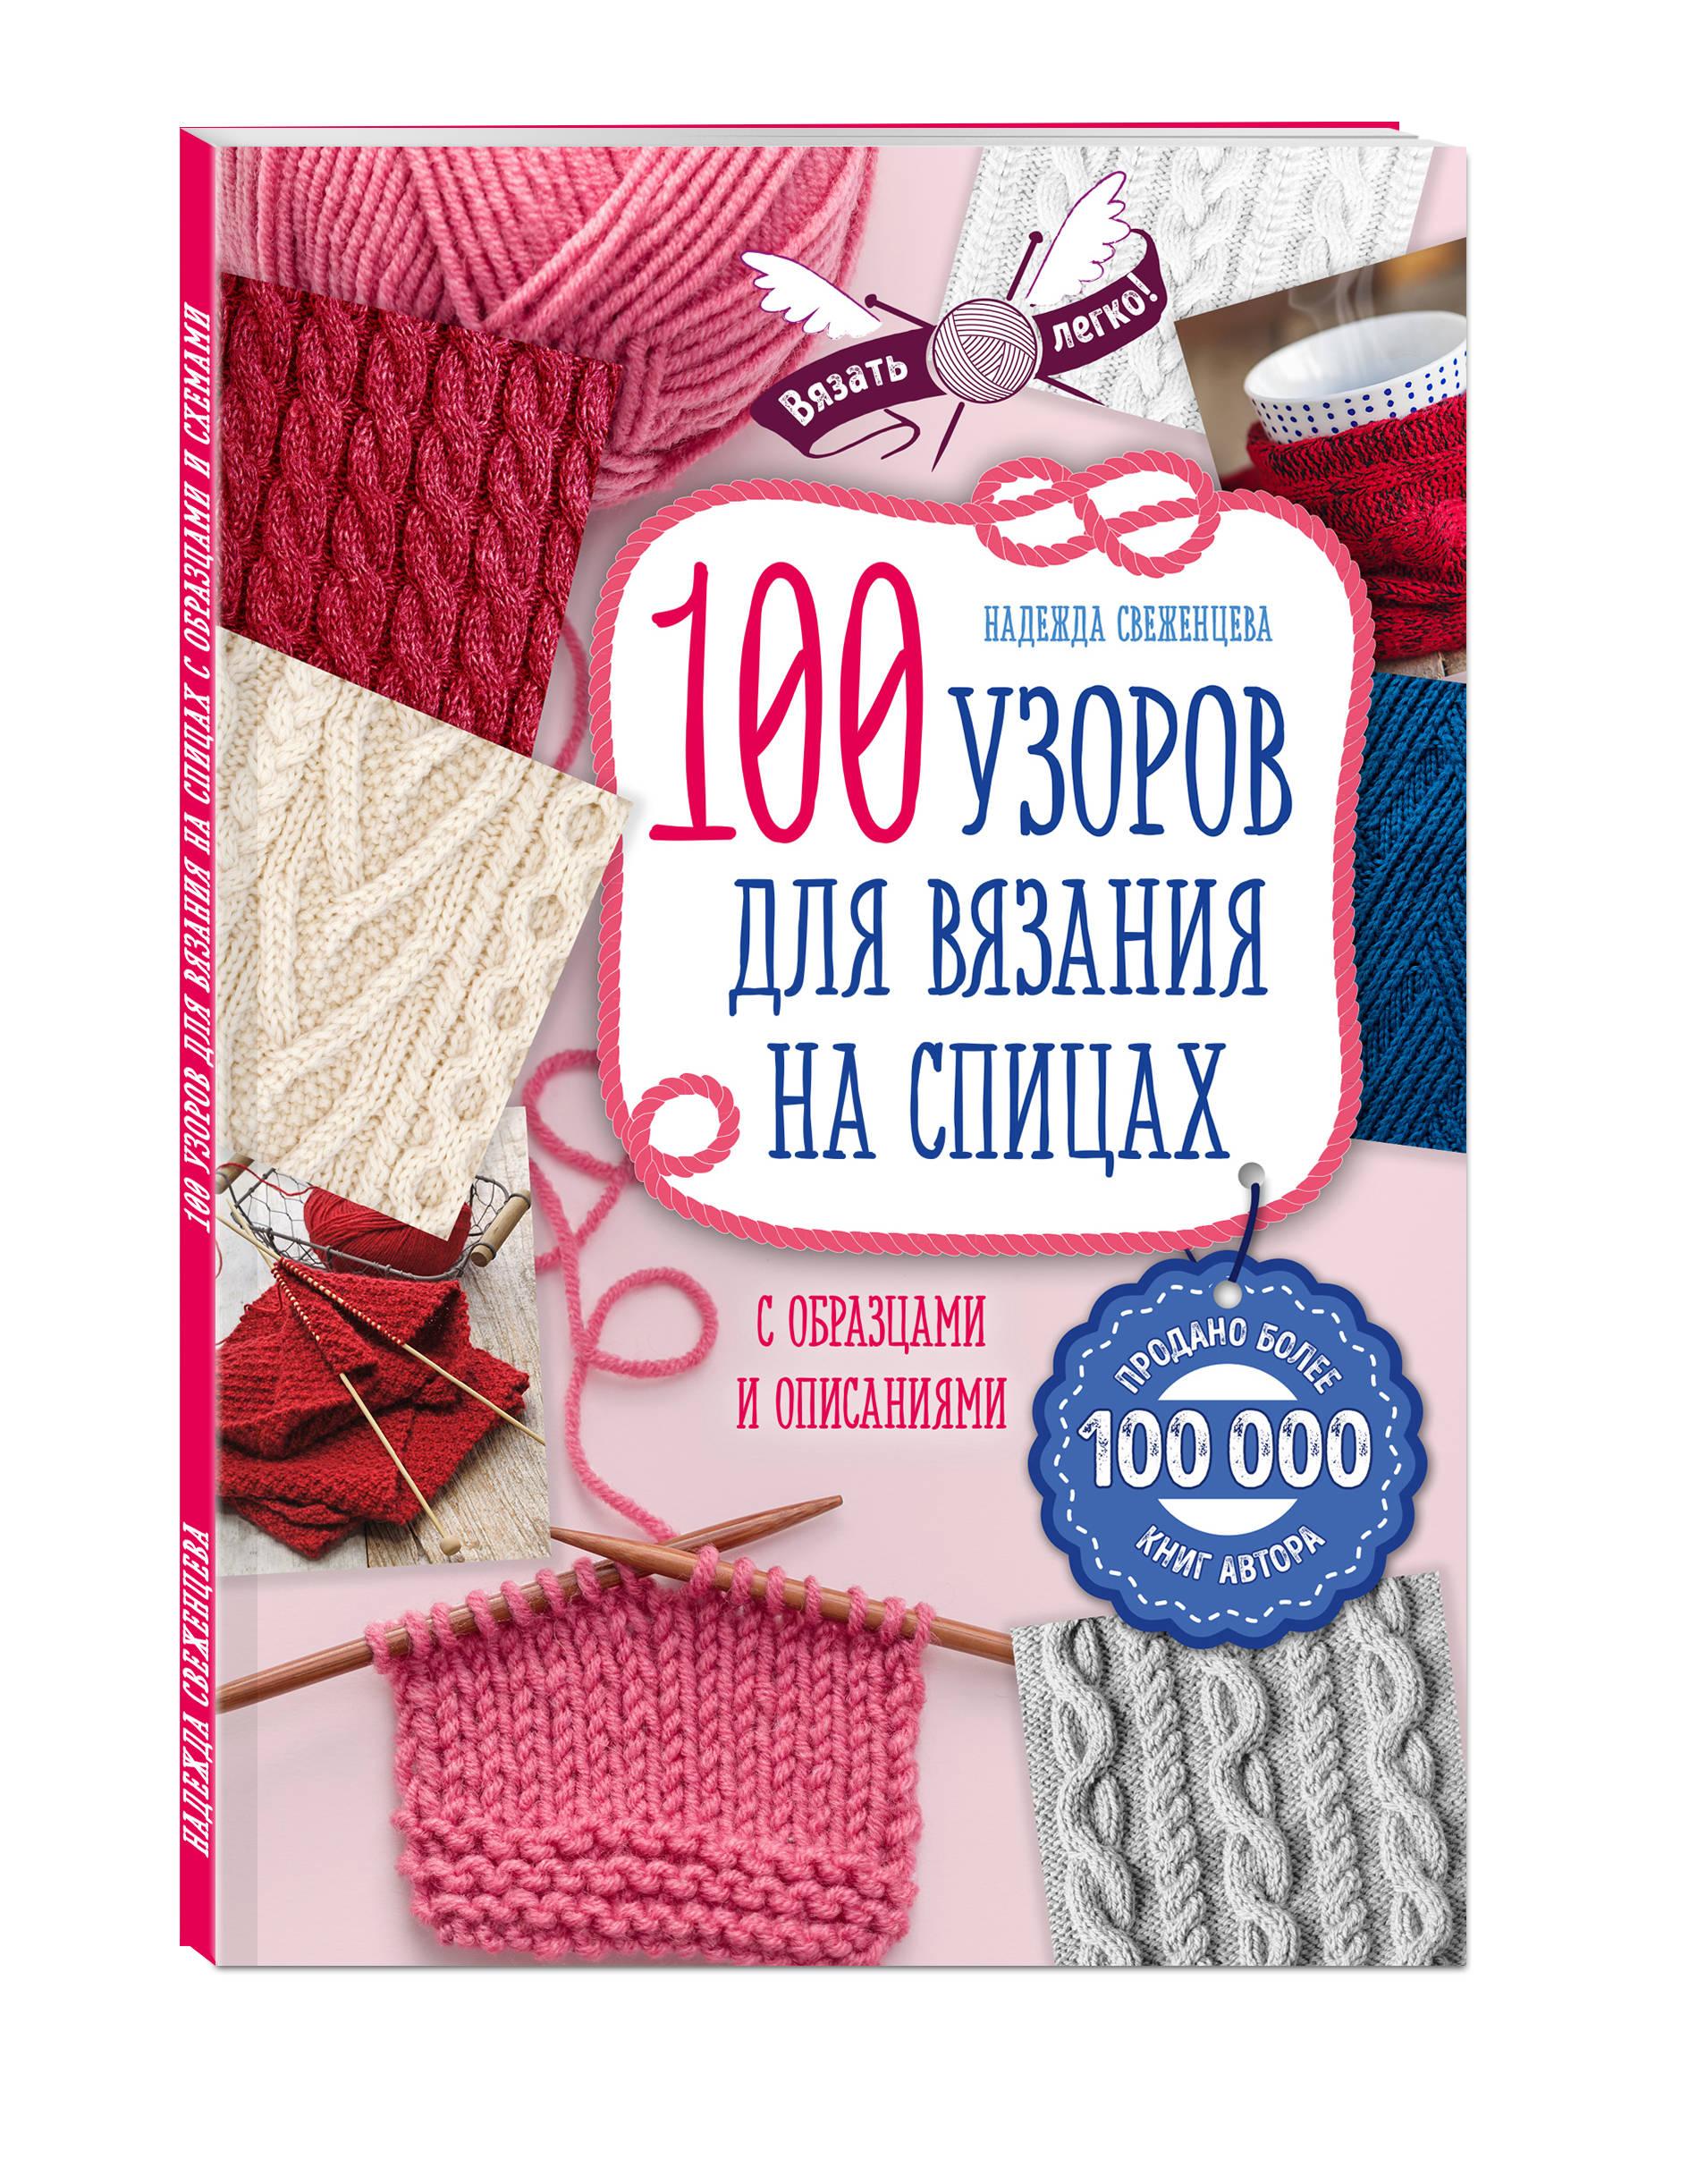 100 узоров для вязания на спицах ( Свеженцева Н.А.  )